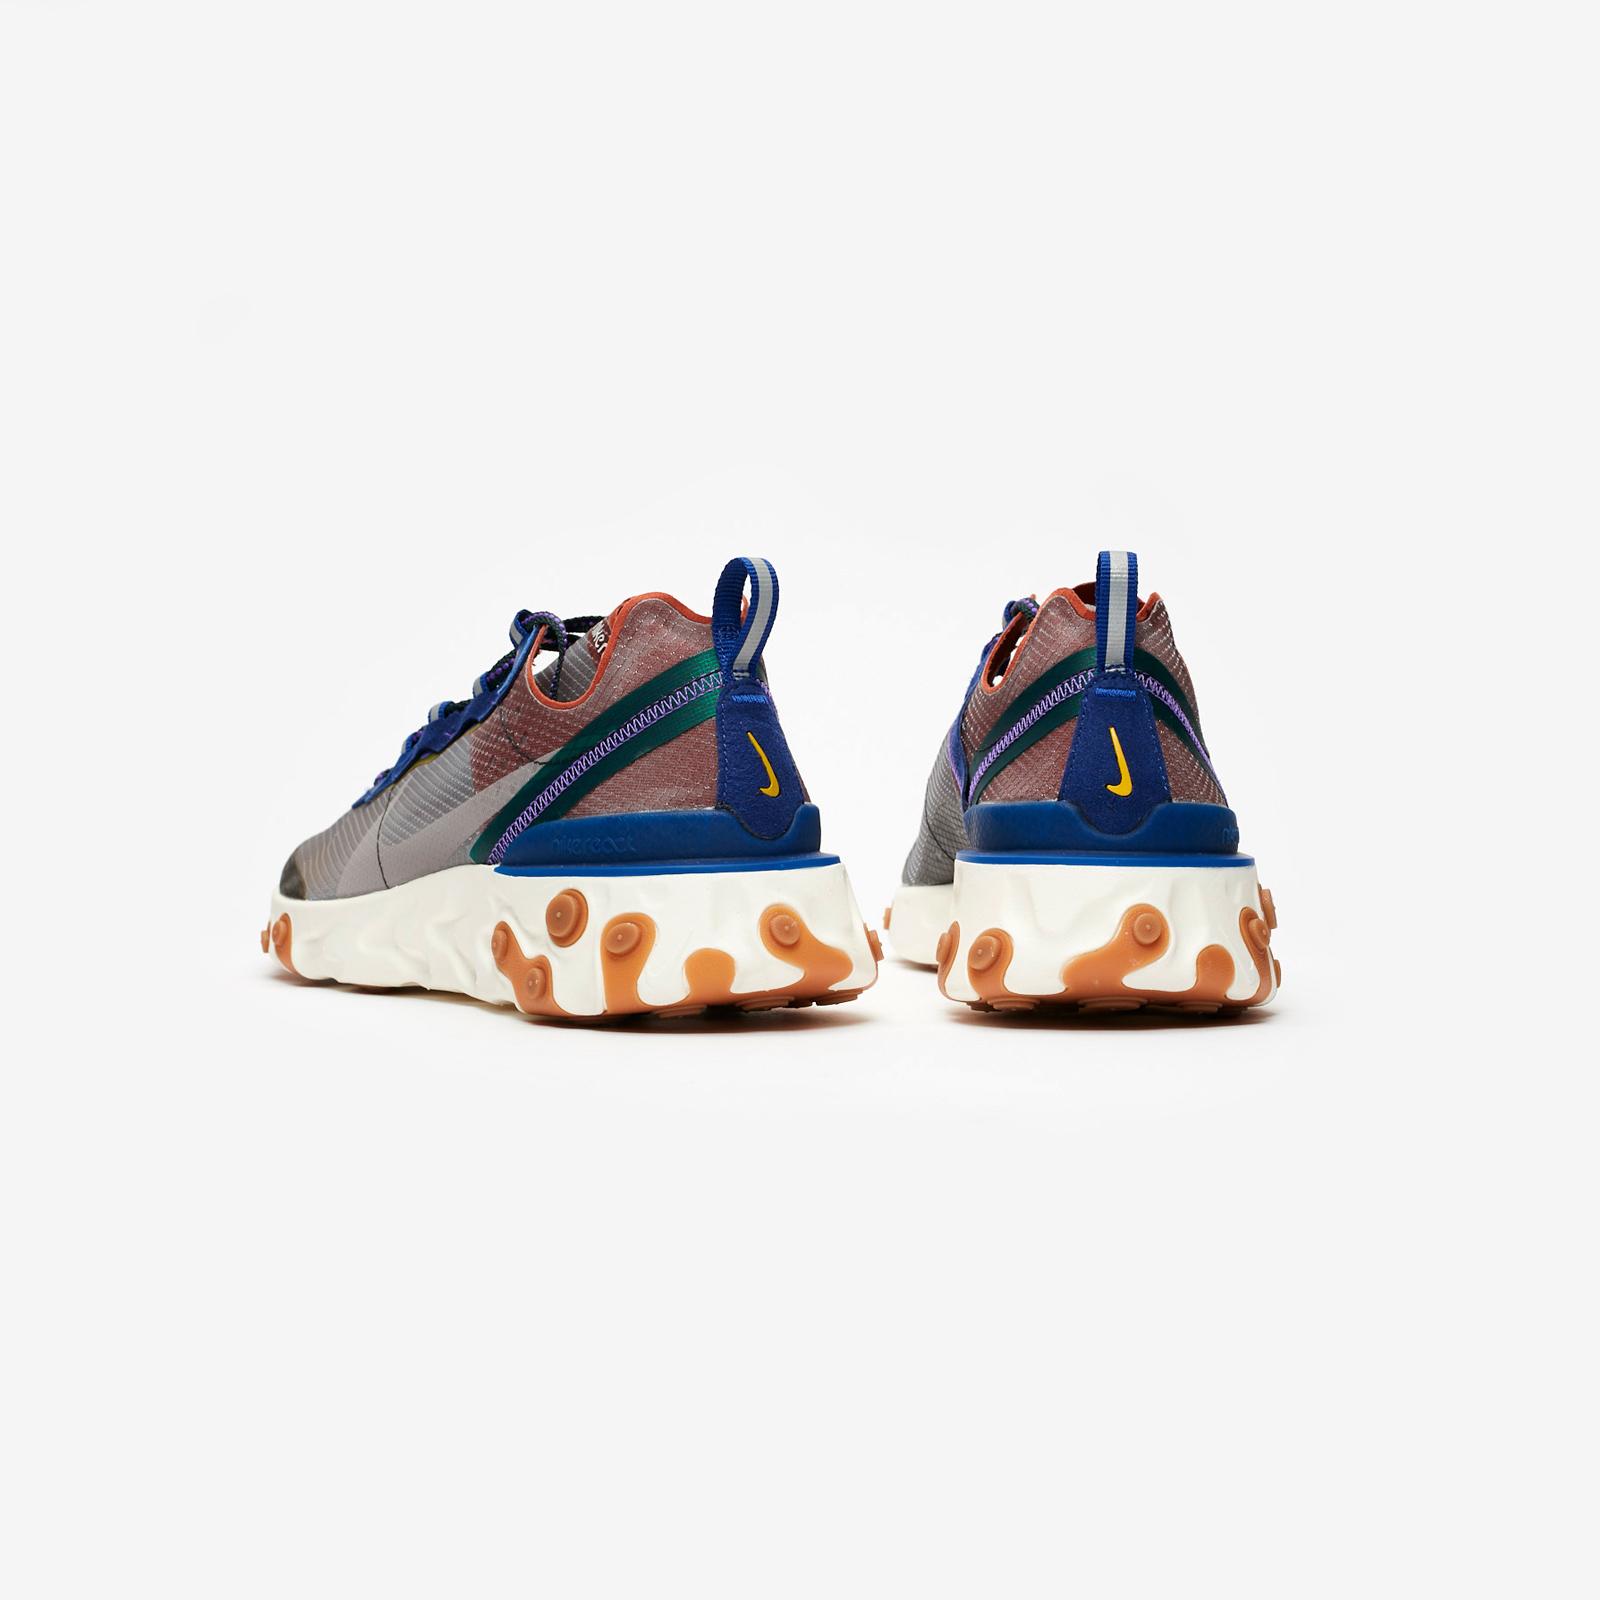 Element Nike 87 200 Aq1090 React Sneakers I Sneakersnstuff nXw80kNOP